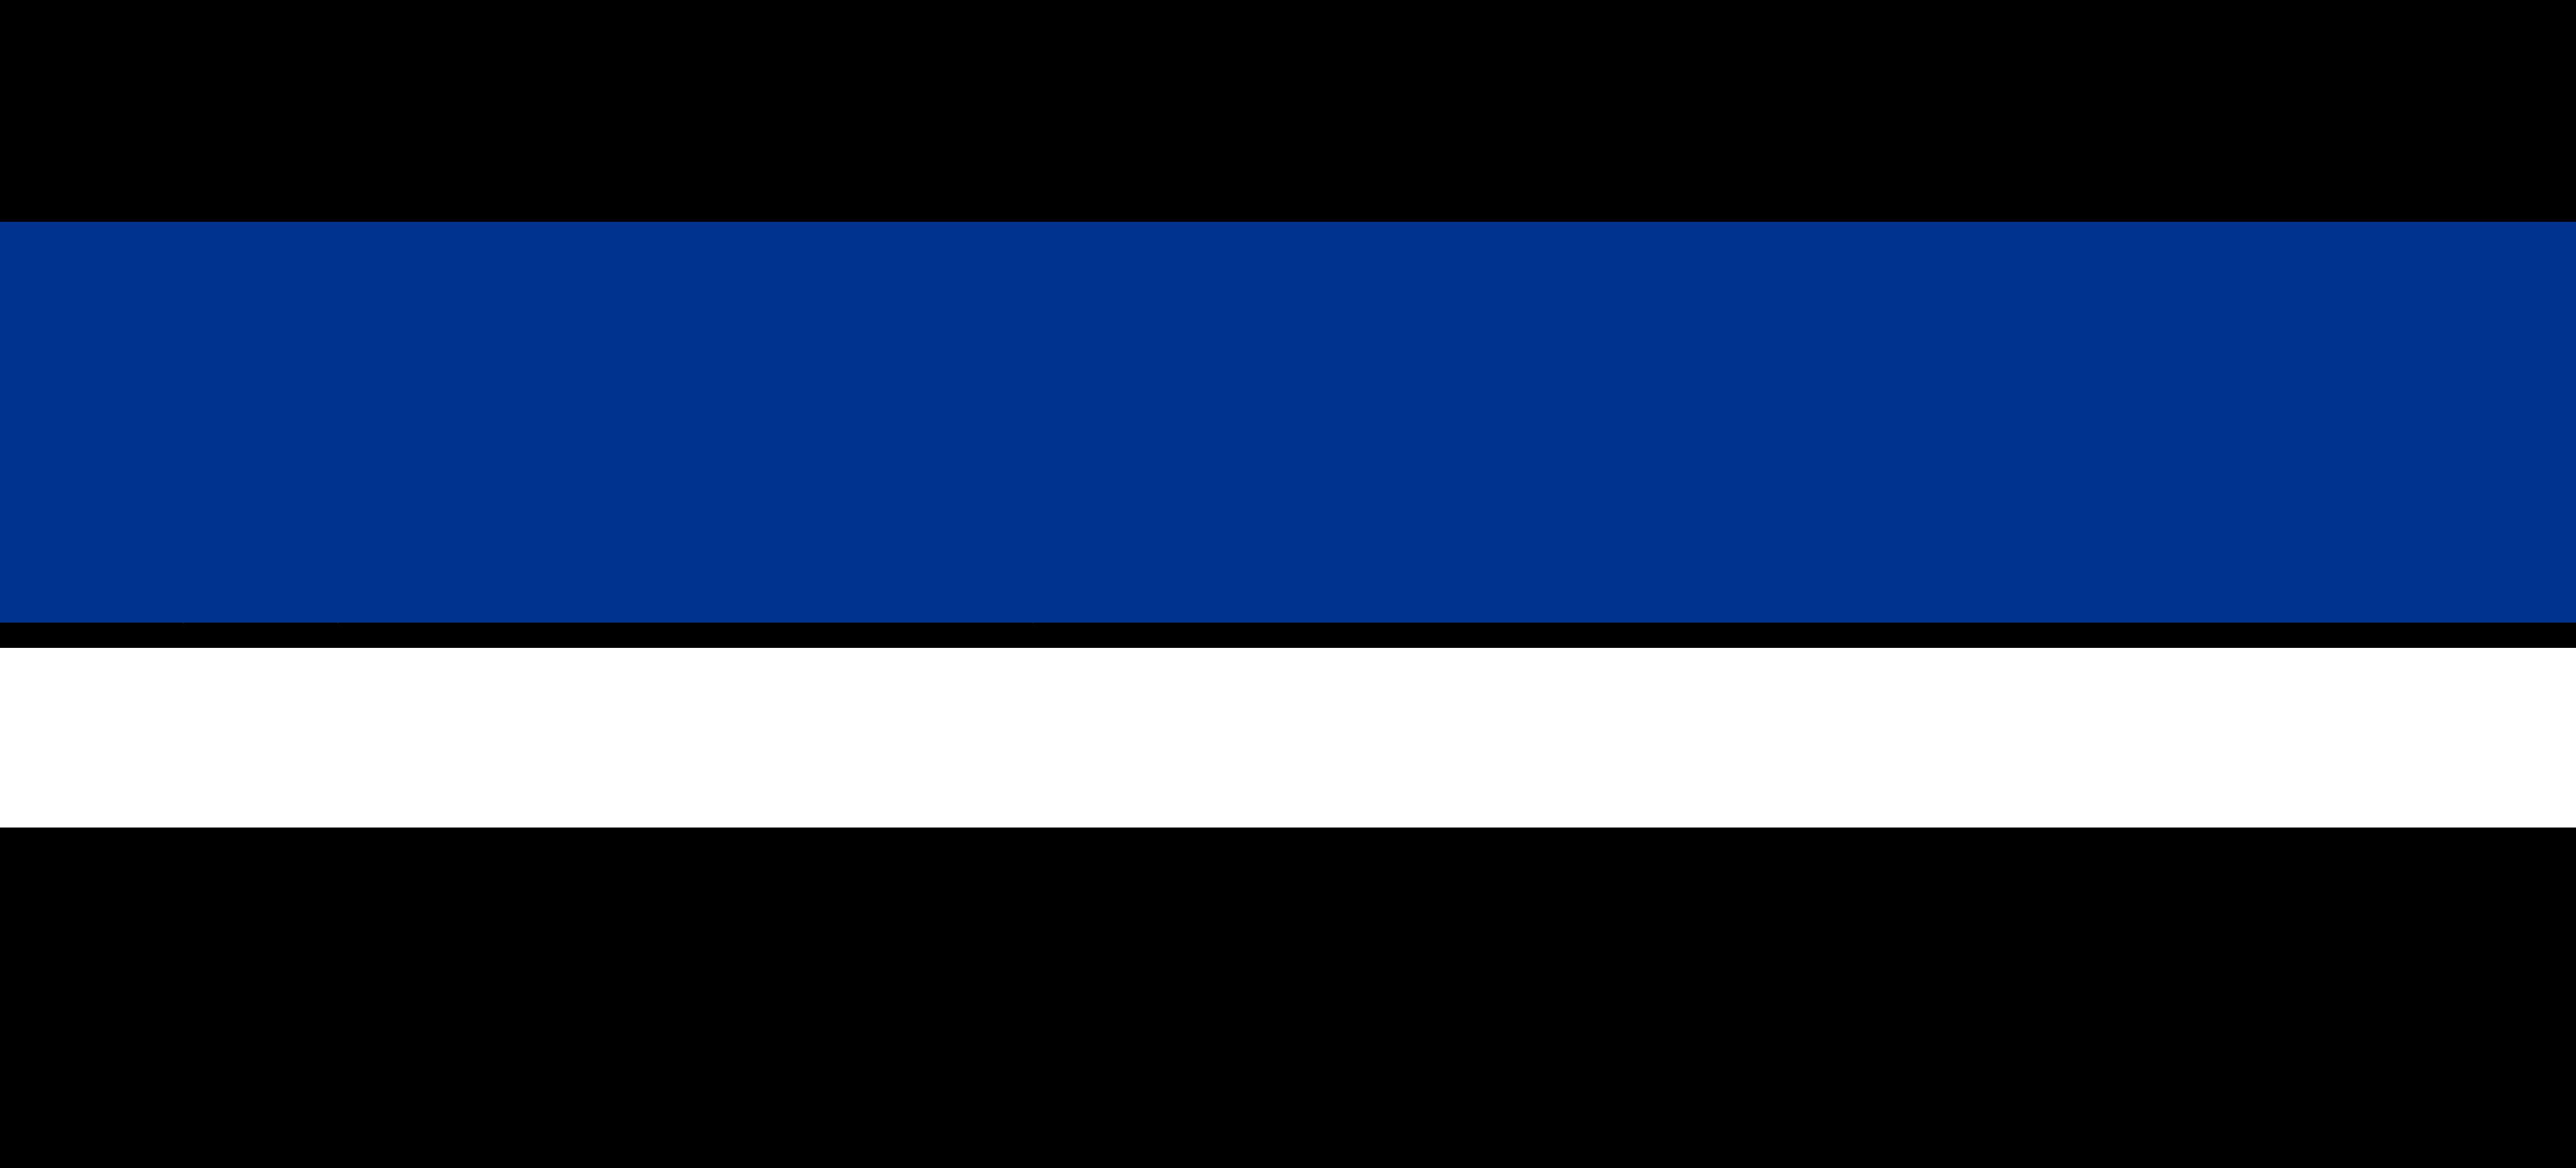 Ben Furman